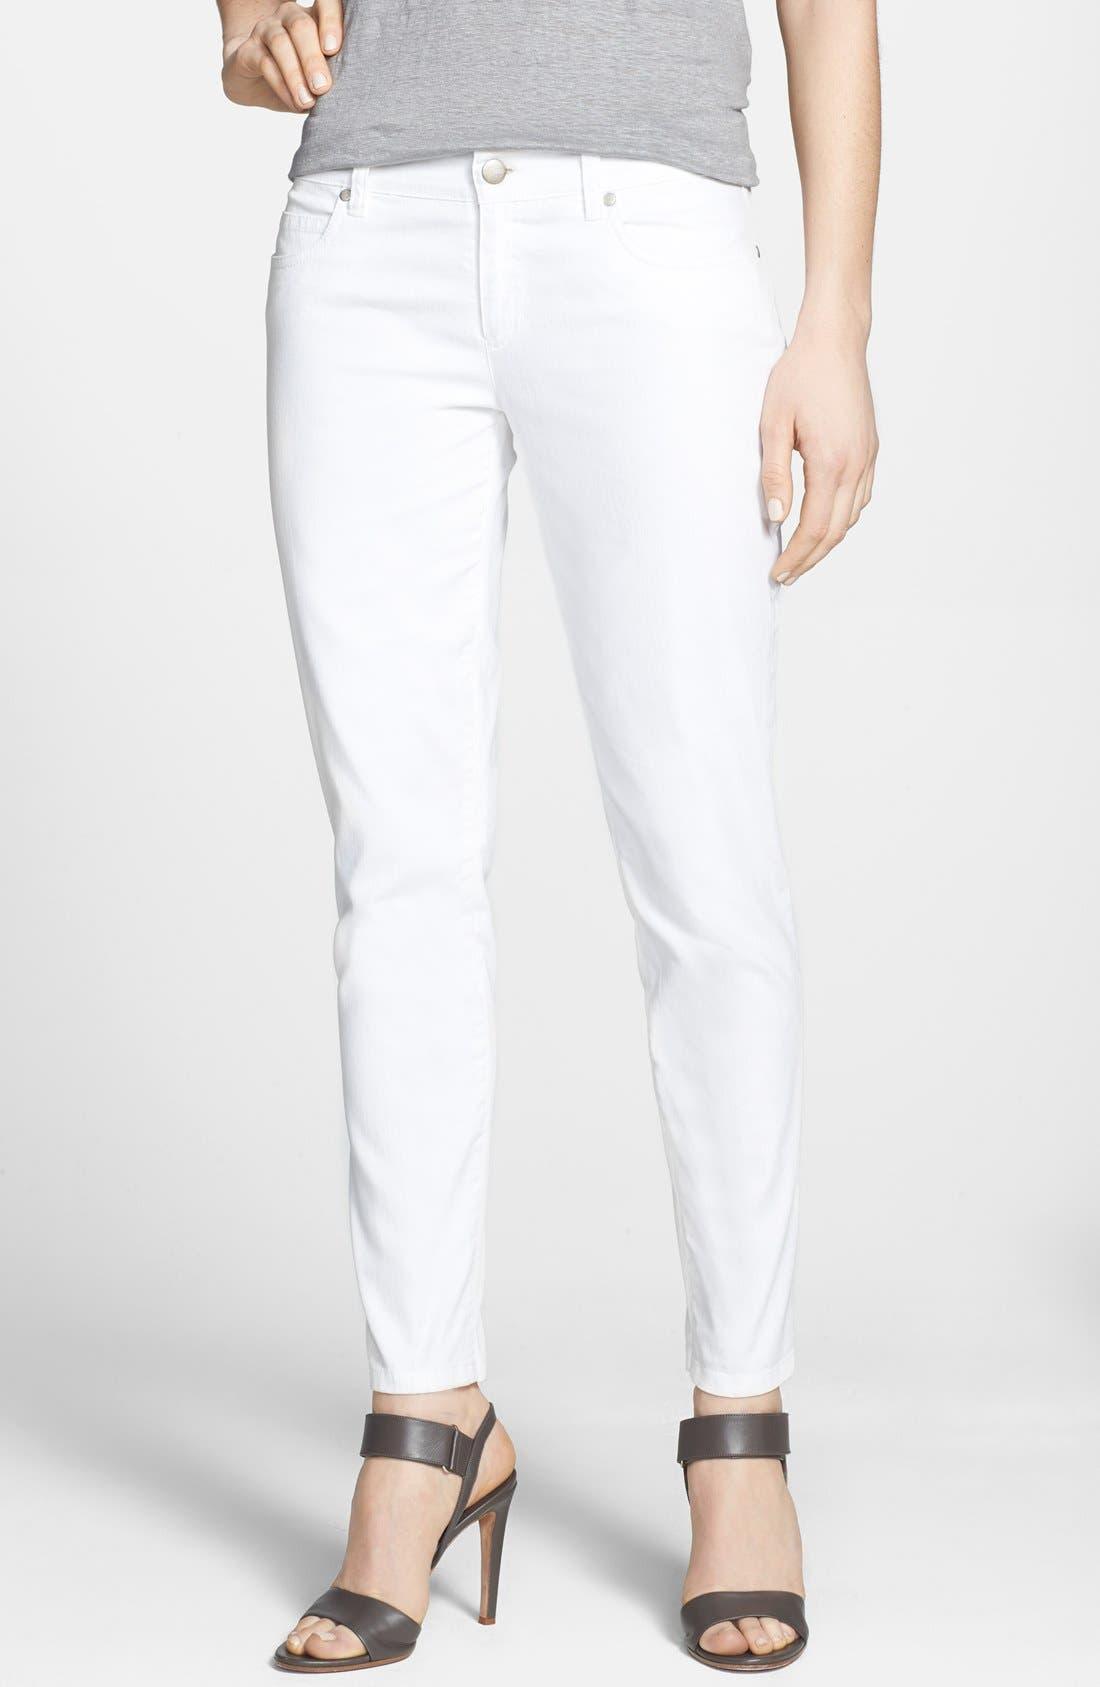 Main Image - Eileen Fisher Stretch Denim Ankle Skinny Jeans (White) (Regular & Petite)